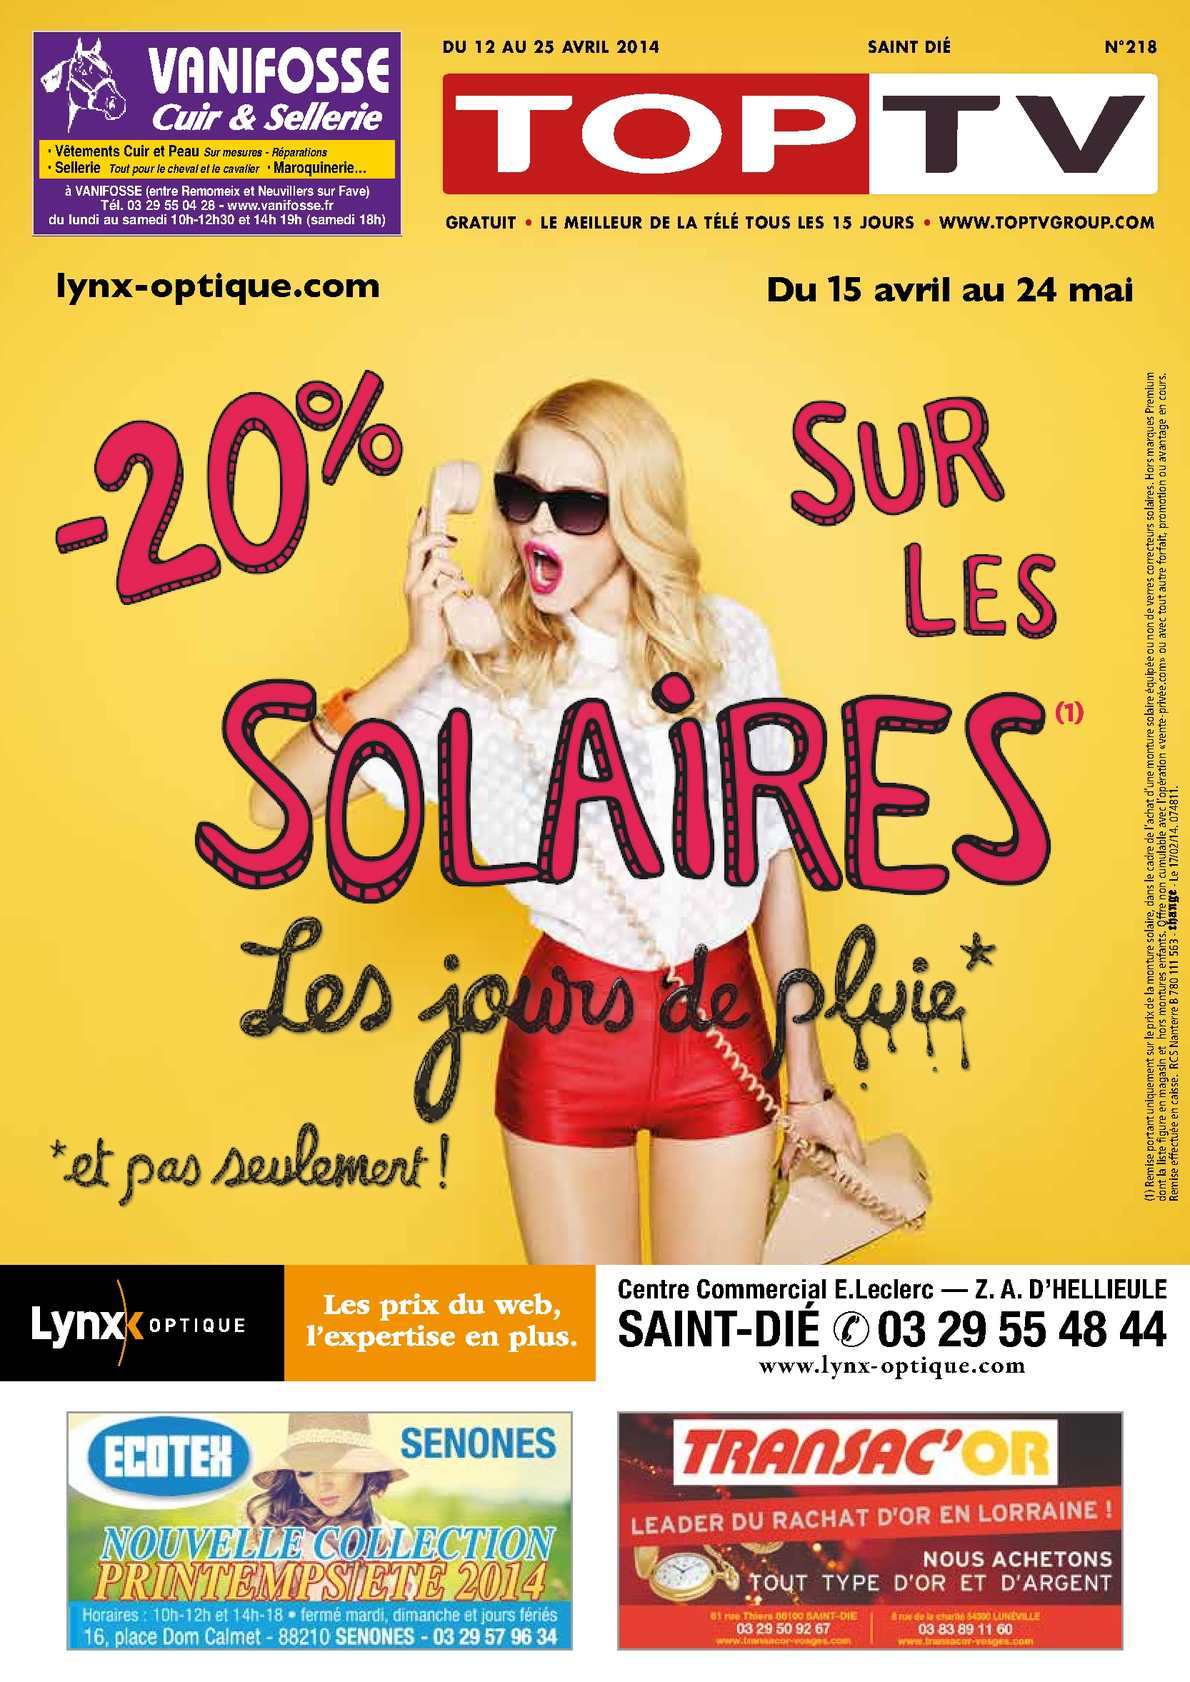 Calaméo - TopTV Saint-Dié 218 da24a74b9225